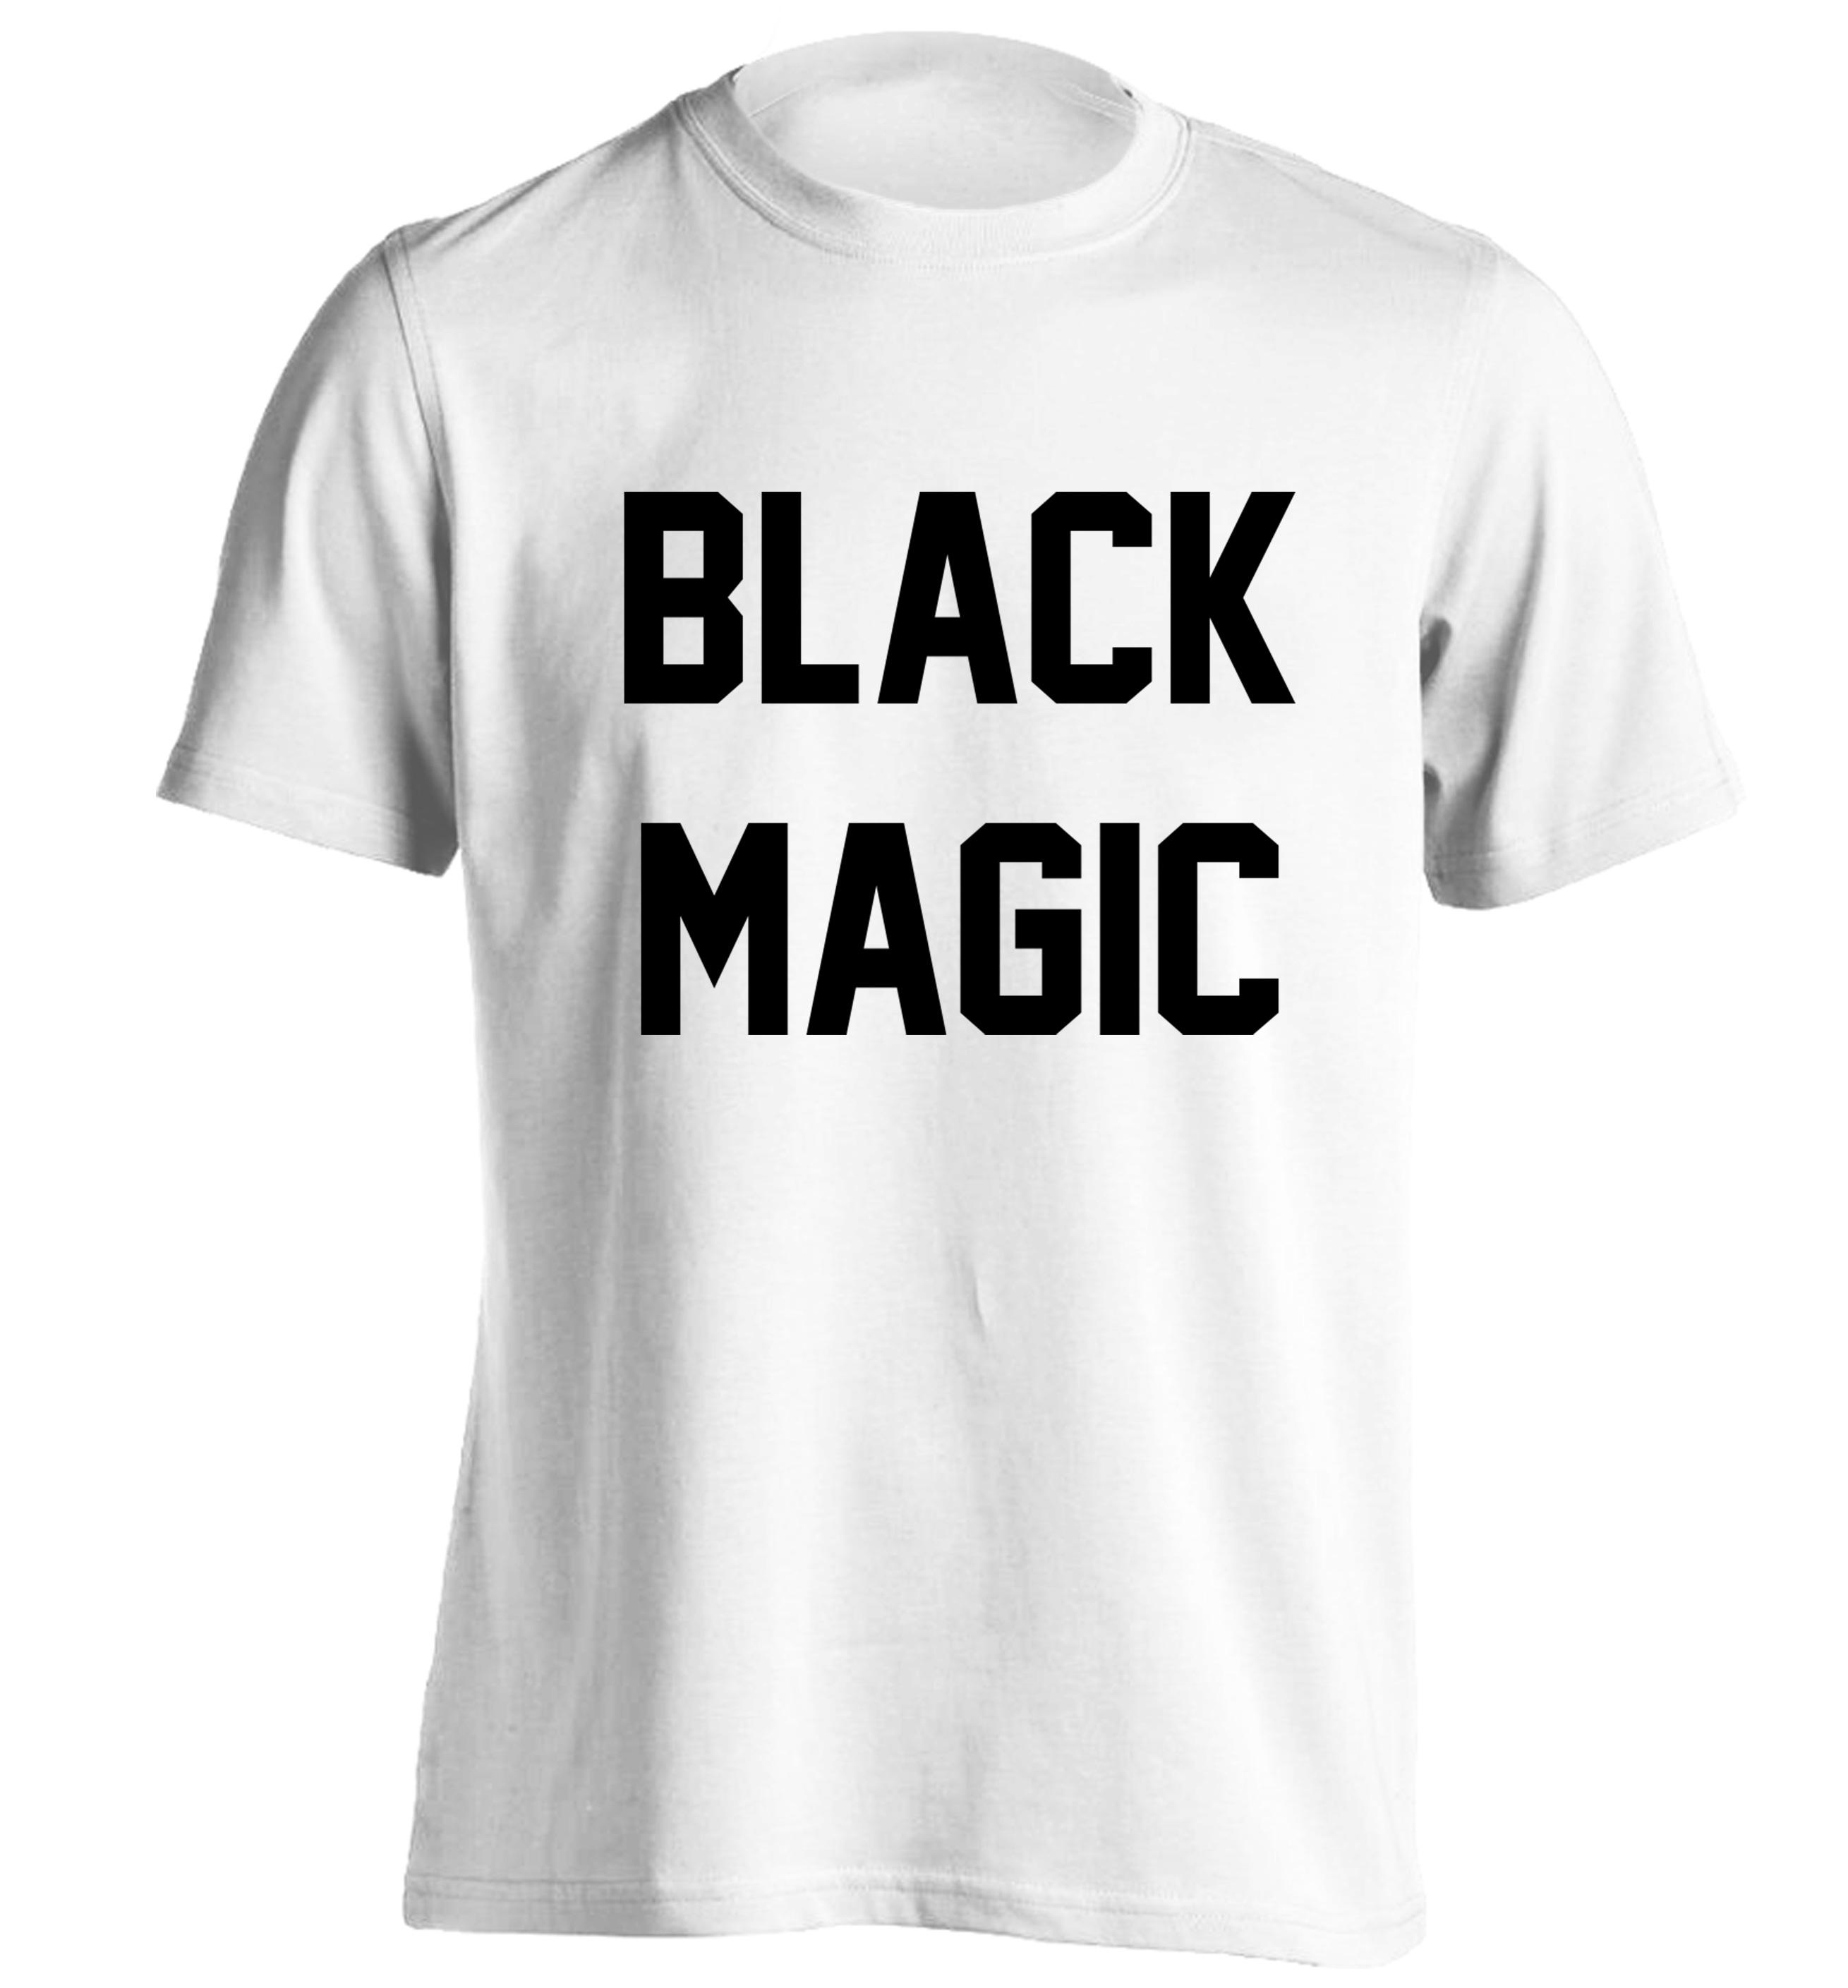 Black t shirt grunge -  Black Magic Tshirt White Hipster Tumblr Instagram Weheartit Music Lyrics Pop Little Mixer Jesy Witch Halloween